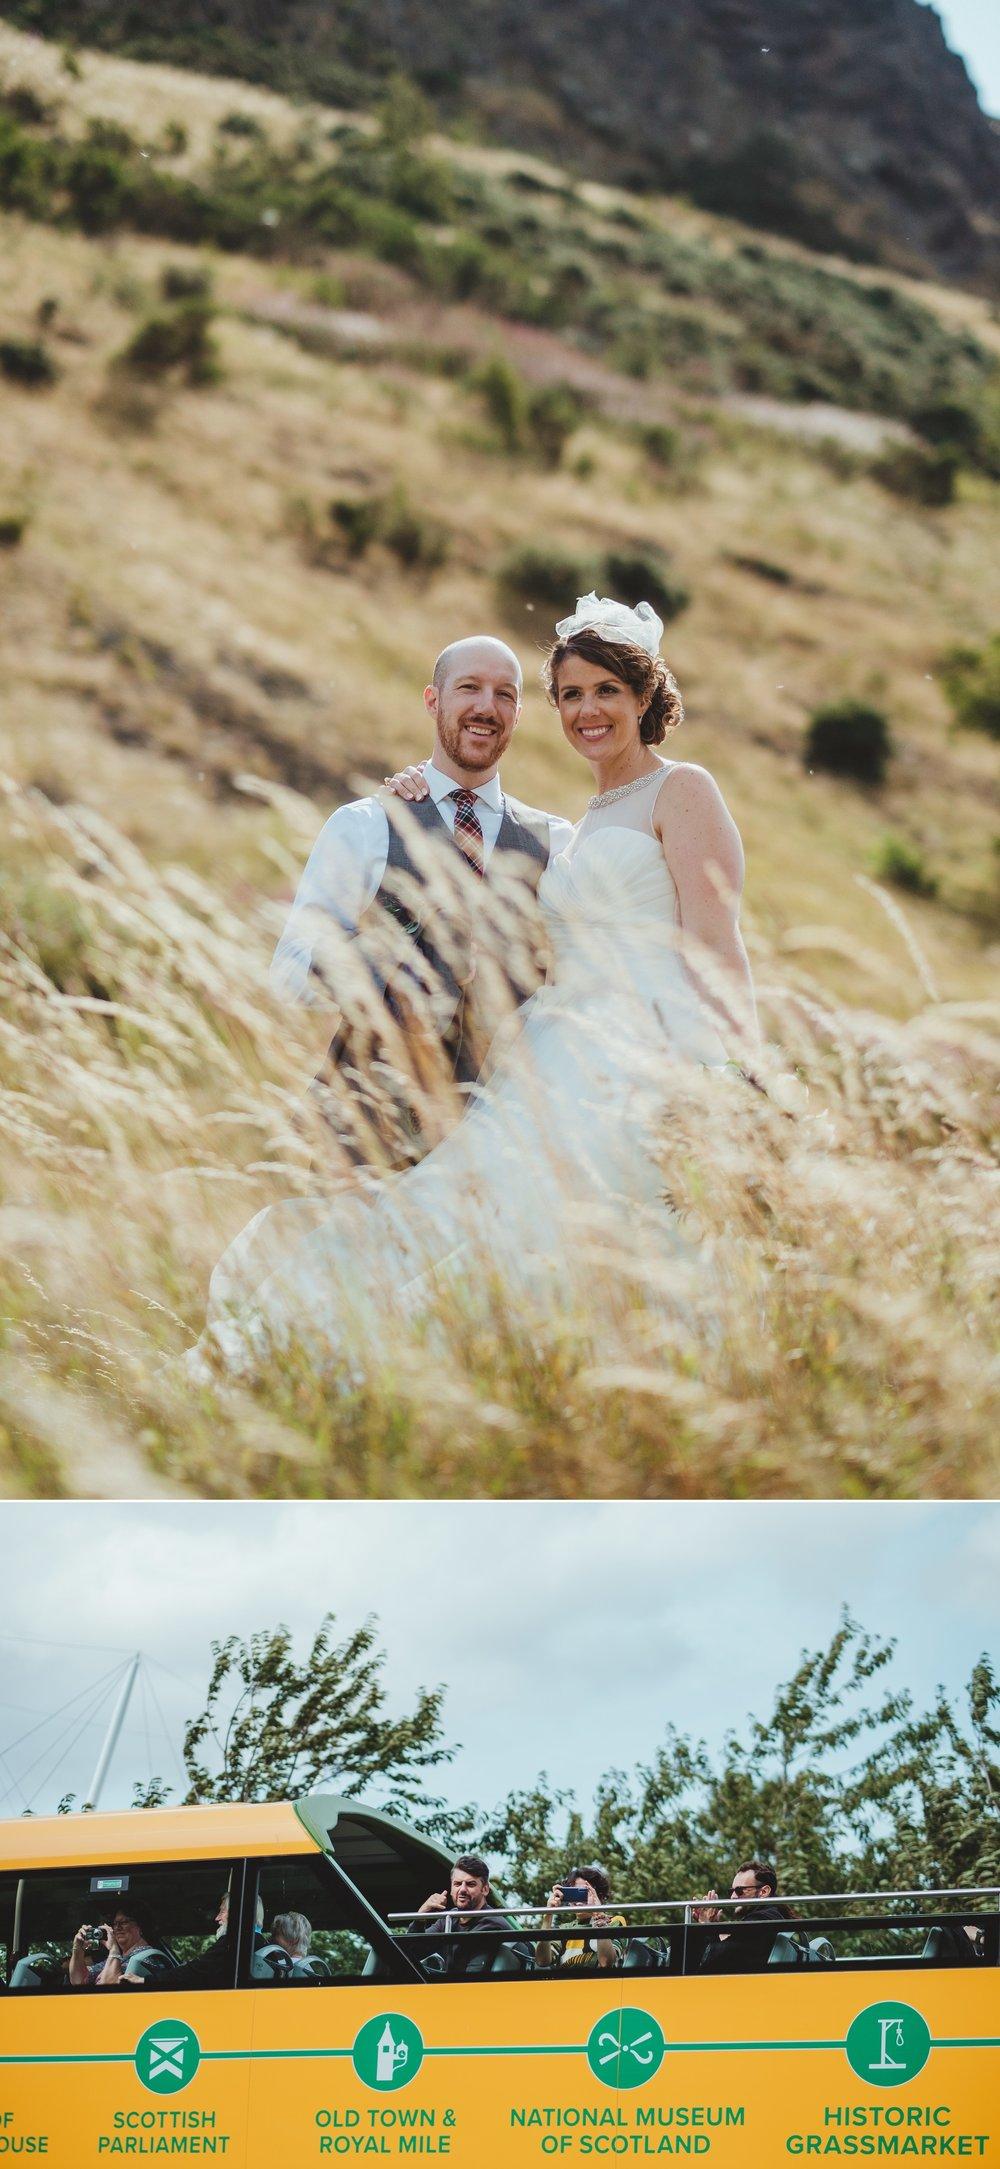 Angela___Andy_s_Edinburgh_elopement_by_Barry_Forshaw_0271.jpg